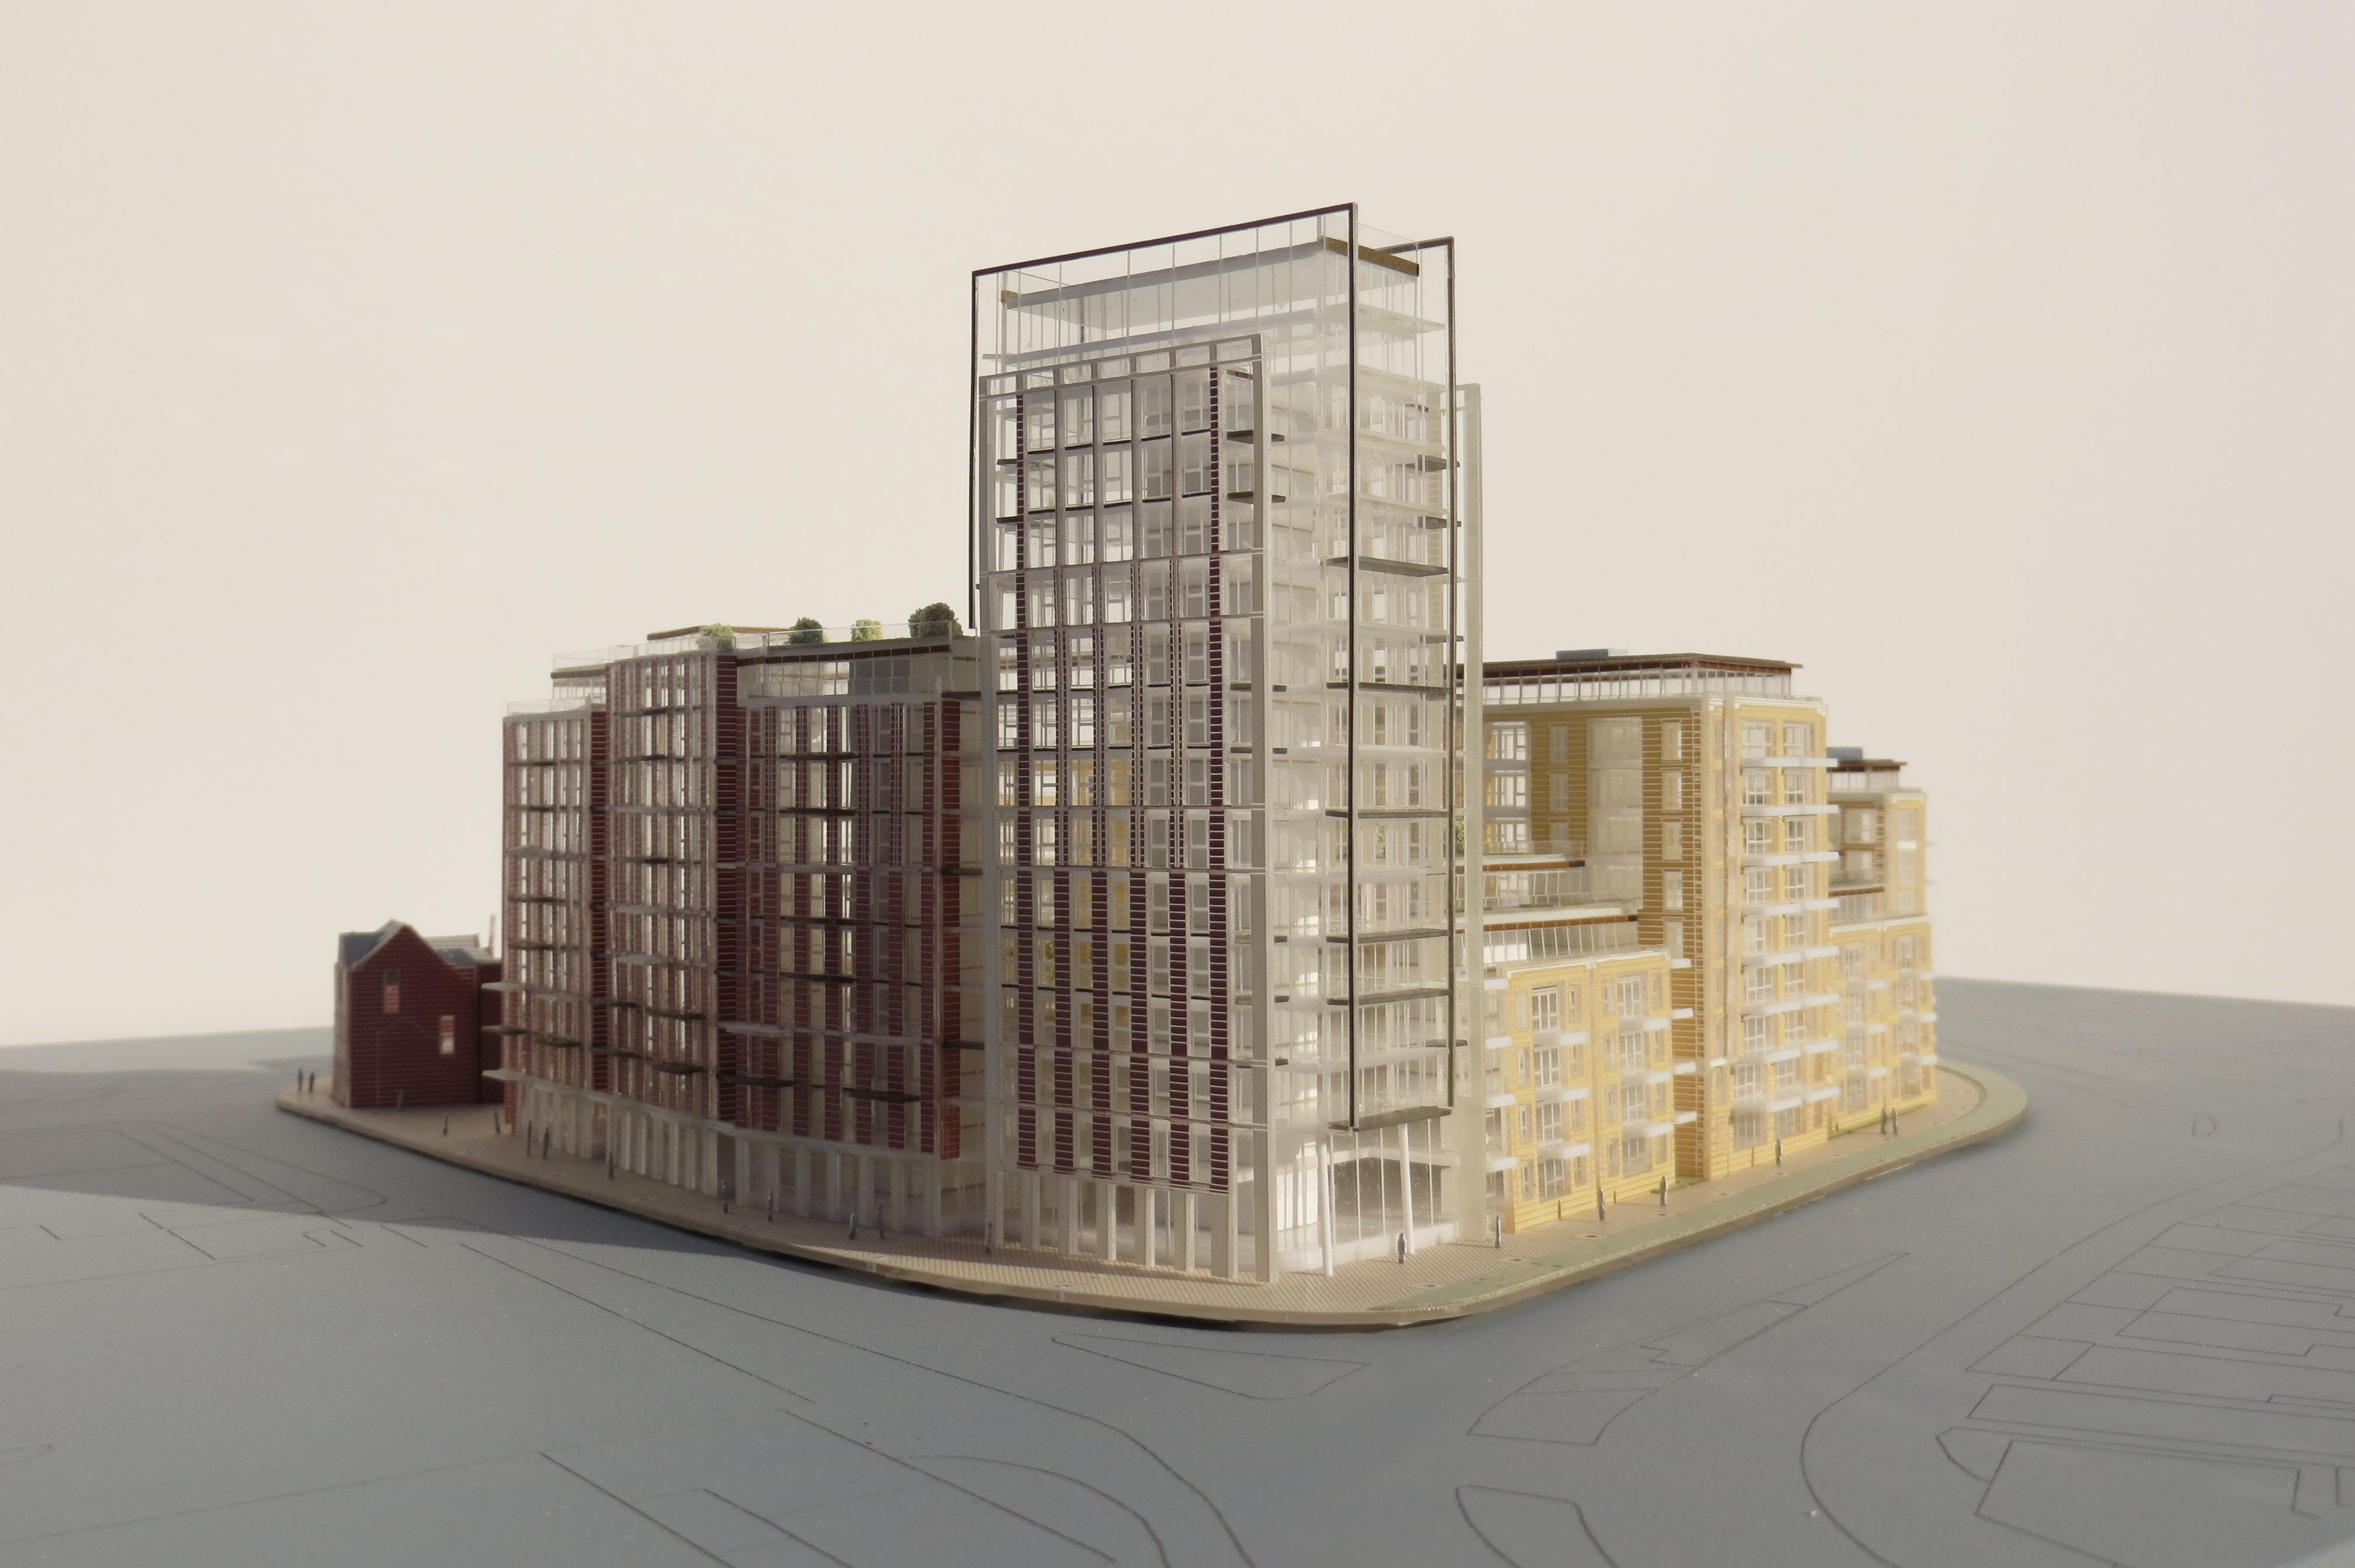 Maquette London Architectural Model Makers